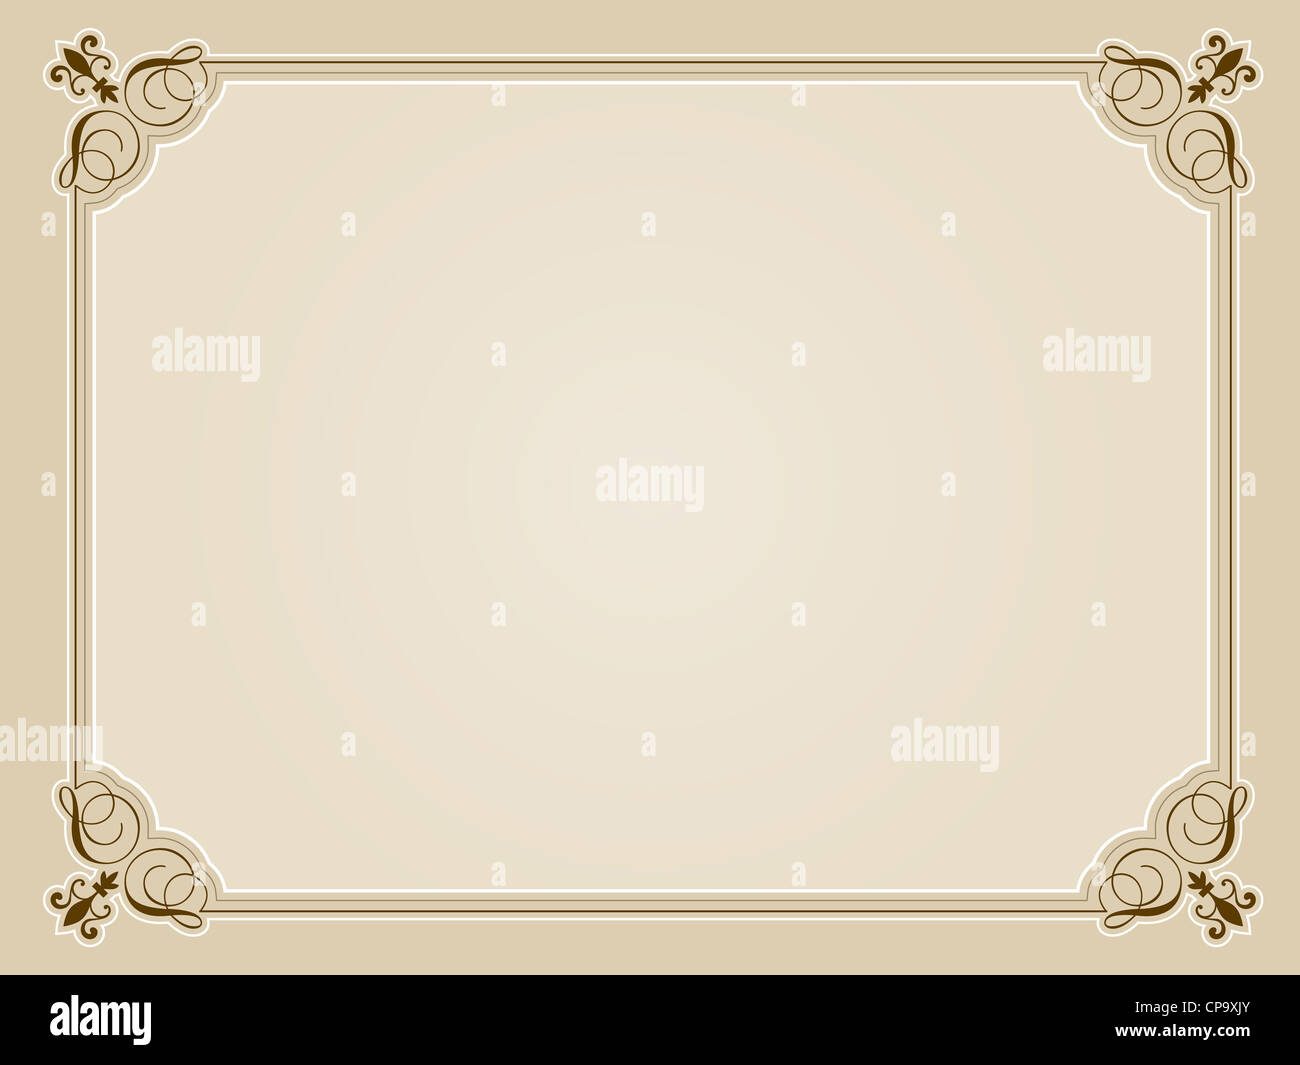 Decorative blank certificate design in sepia tones - Stock Image